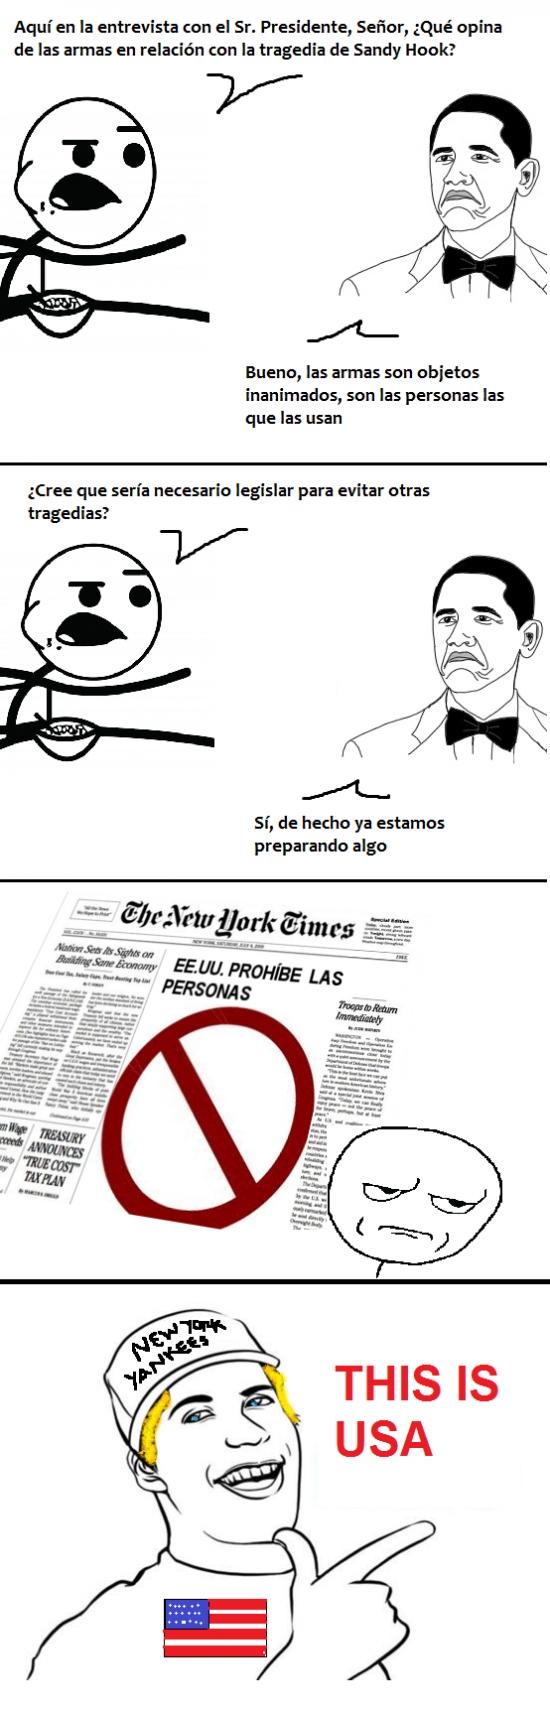 armas,exito,leyes,not bad,obama,prohibicion,usa